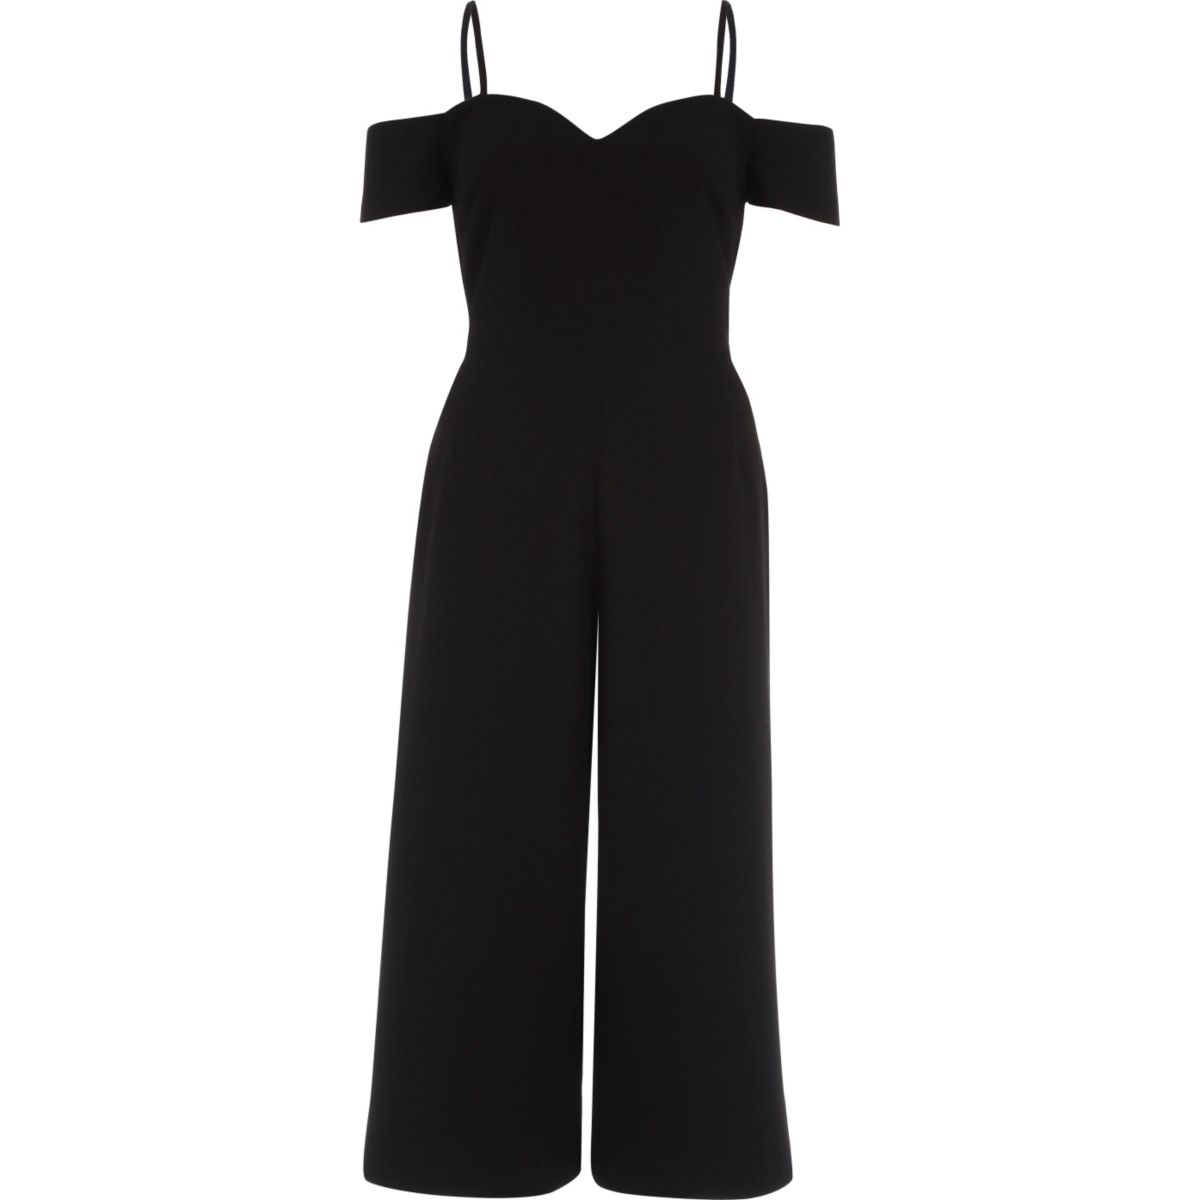 Black bardot fitted culotte jumpsuit